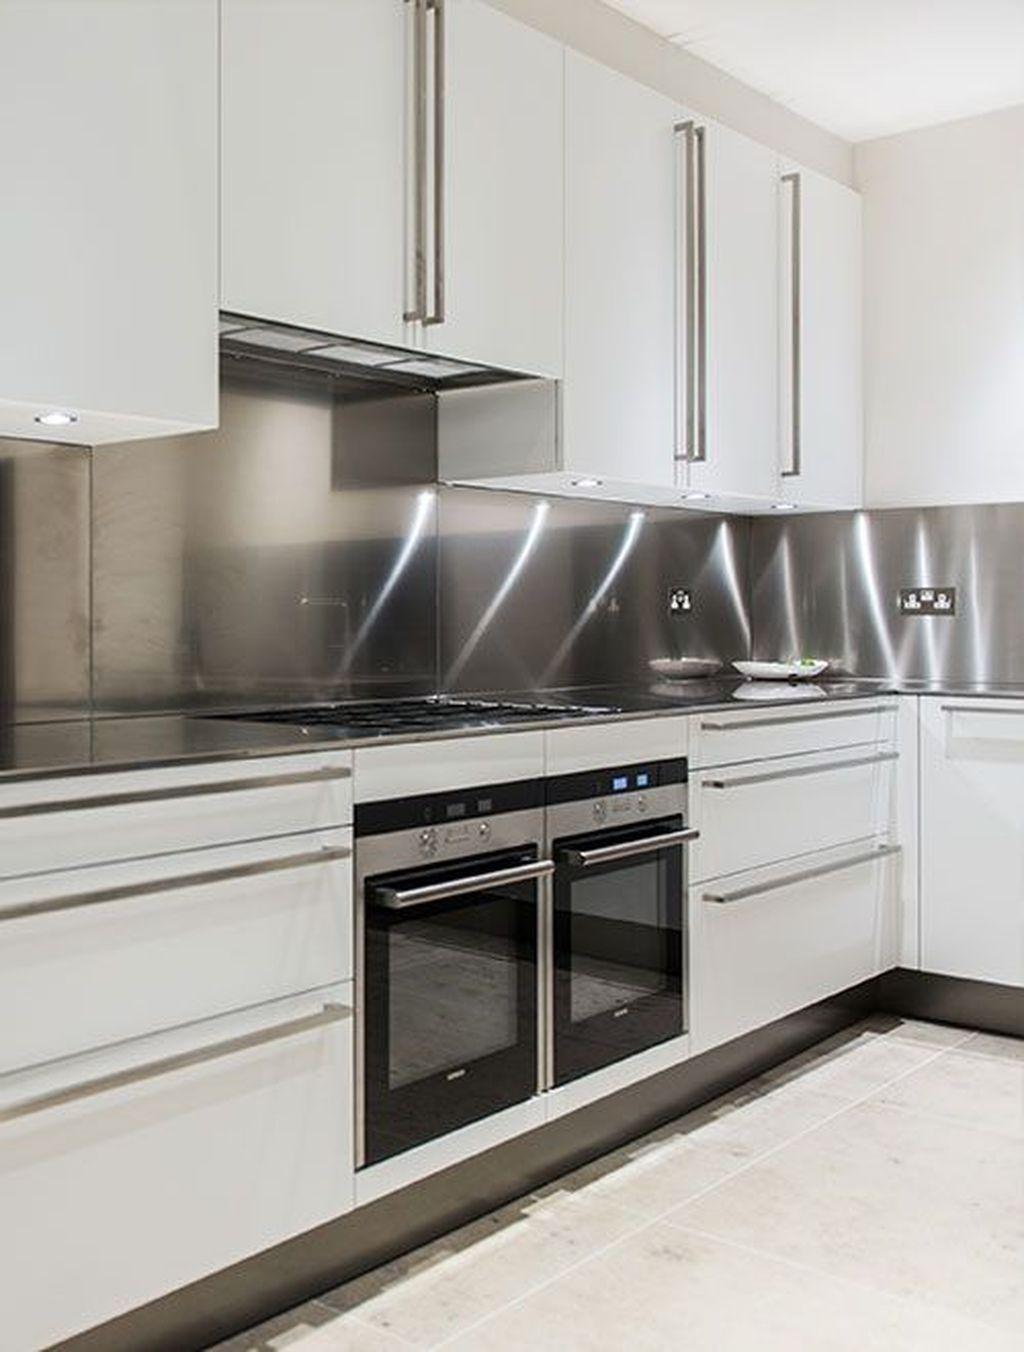 45 Creative Kitchen Cabinet Design Ideas With Stainless Steel Kitchen Cabinet Design Modern Kitchen Kitchen Cabinets Prices